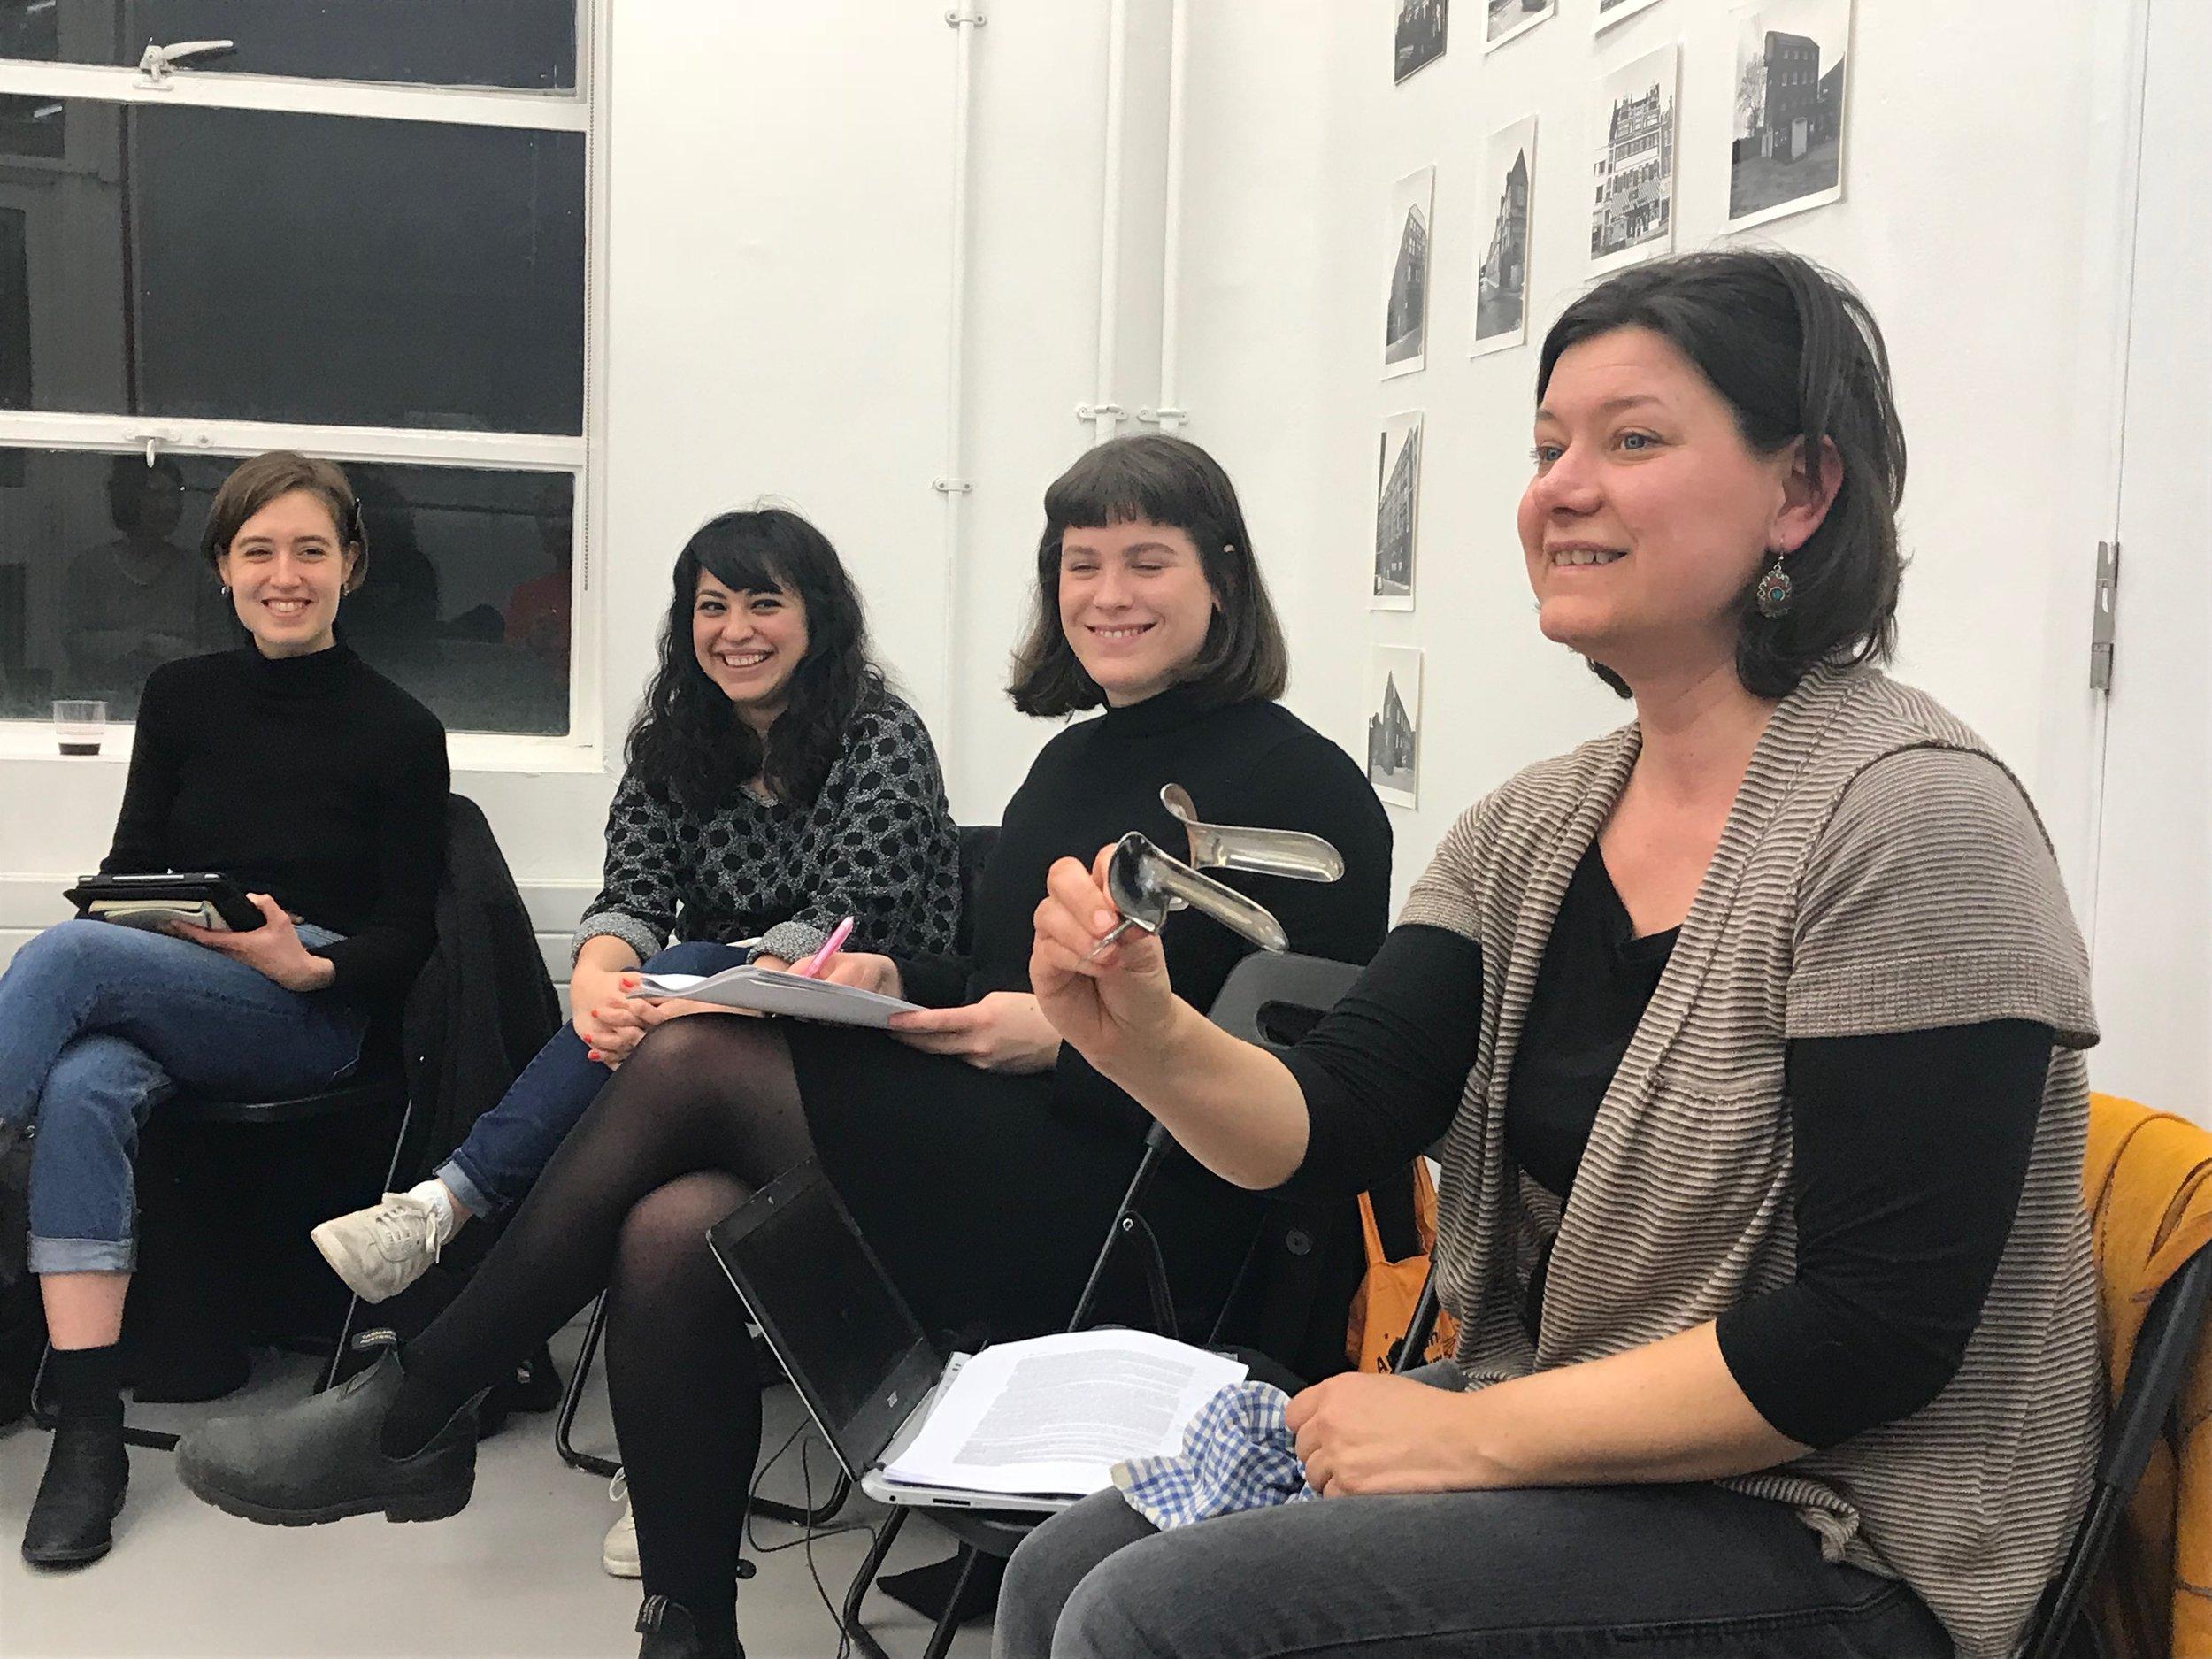 Feminist Duration Reading Group on Lea Melandri, 6th March 2018, led by Sara Paiola (right). Photo Helena Reckitt.